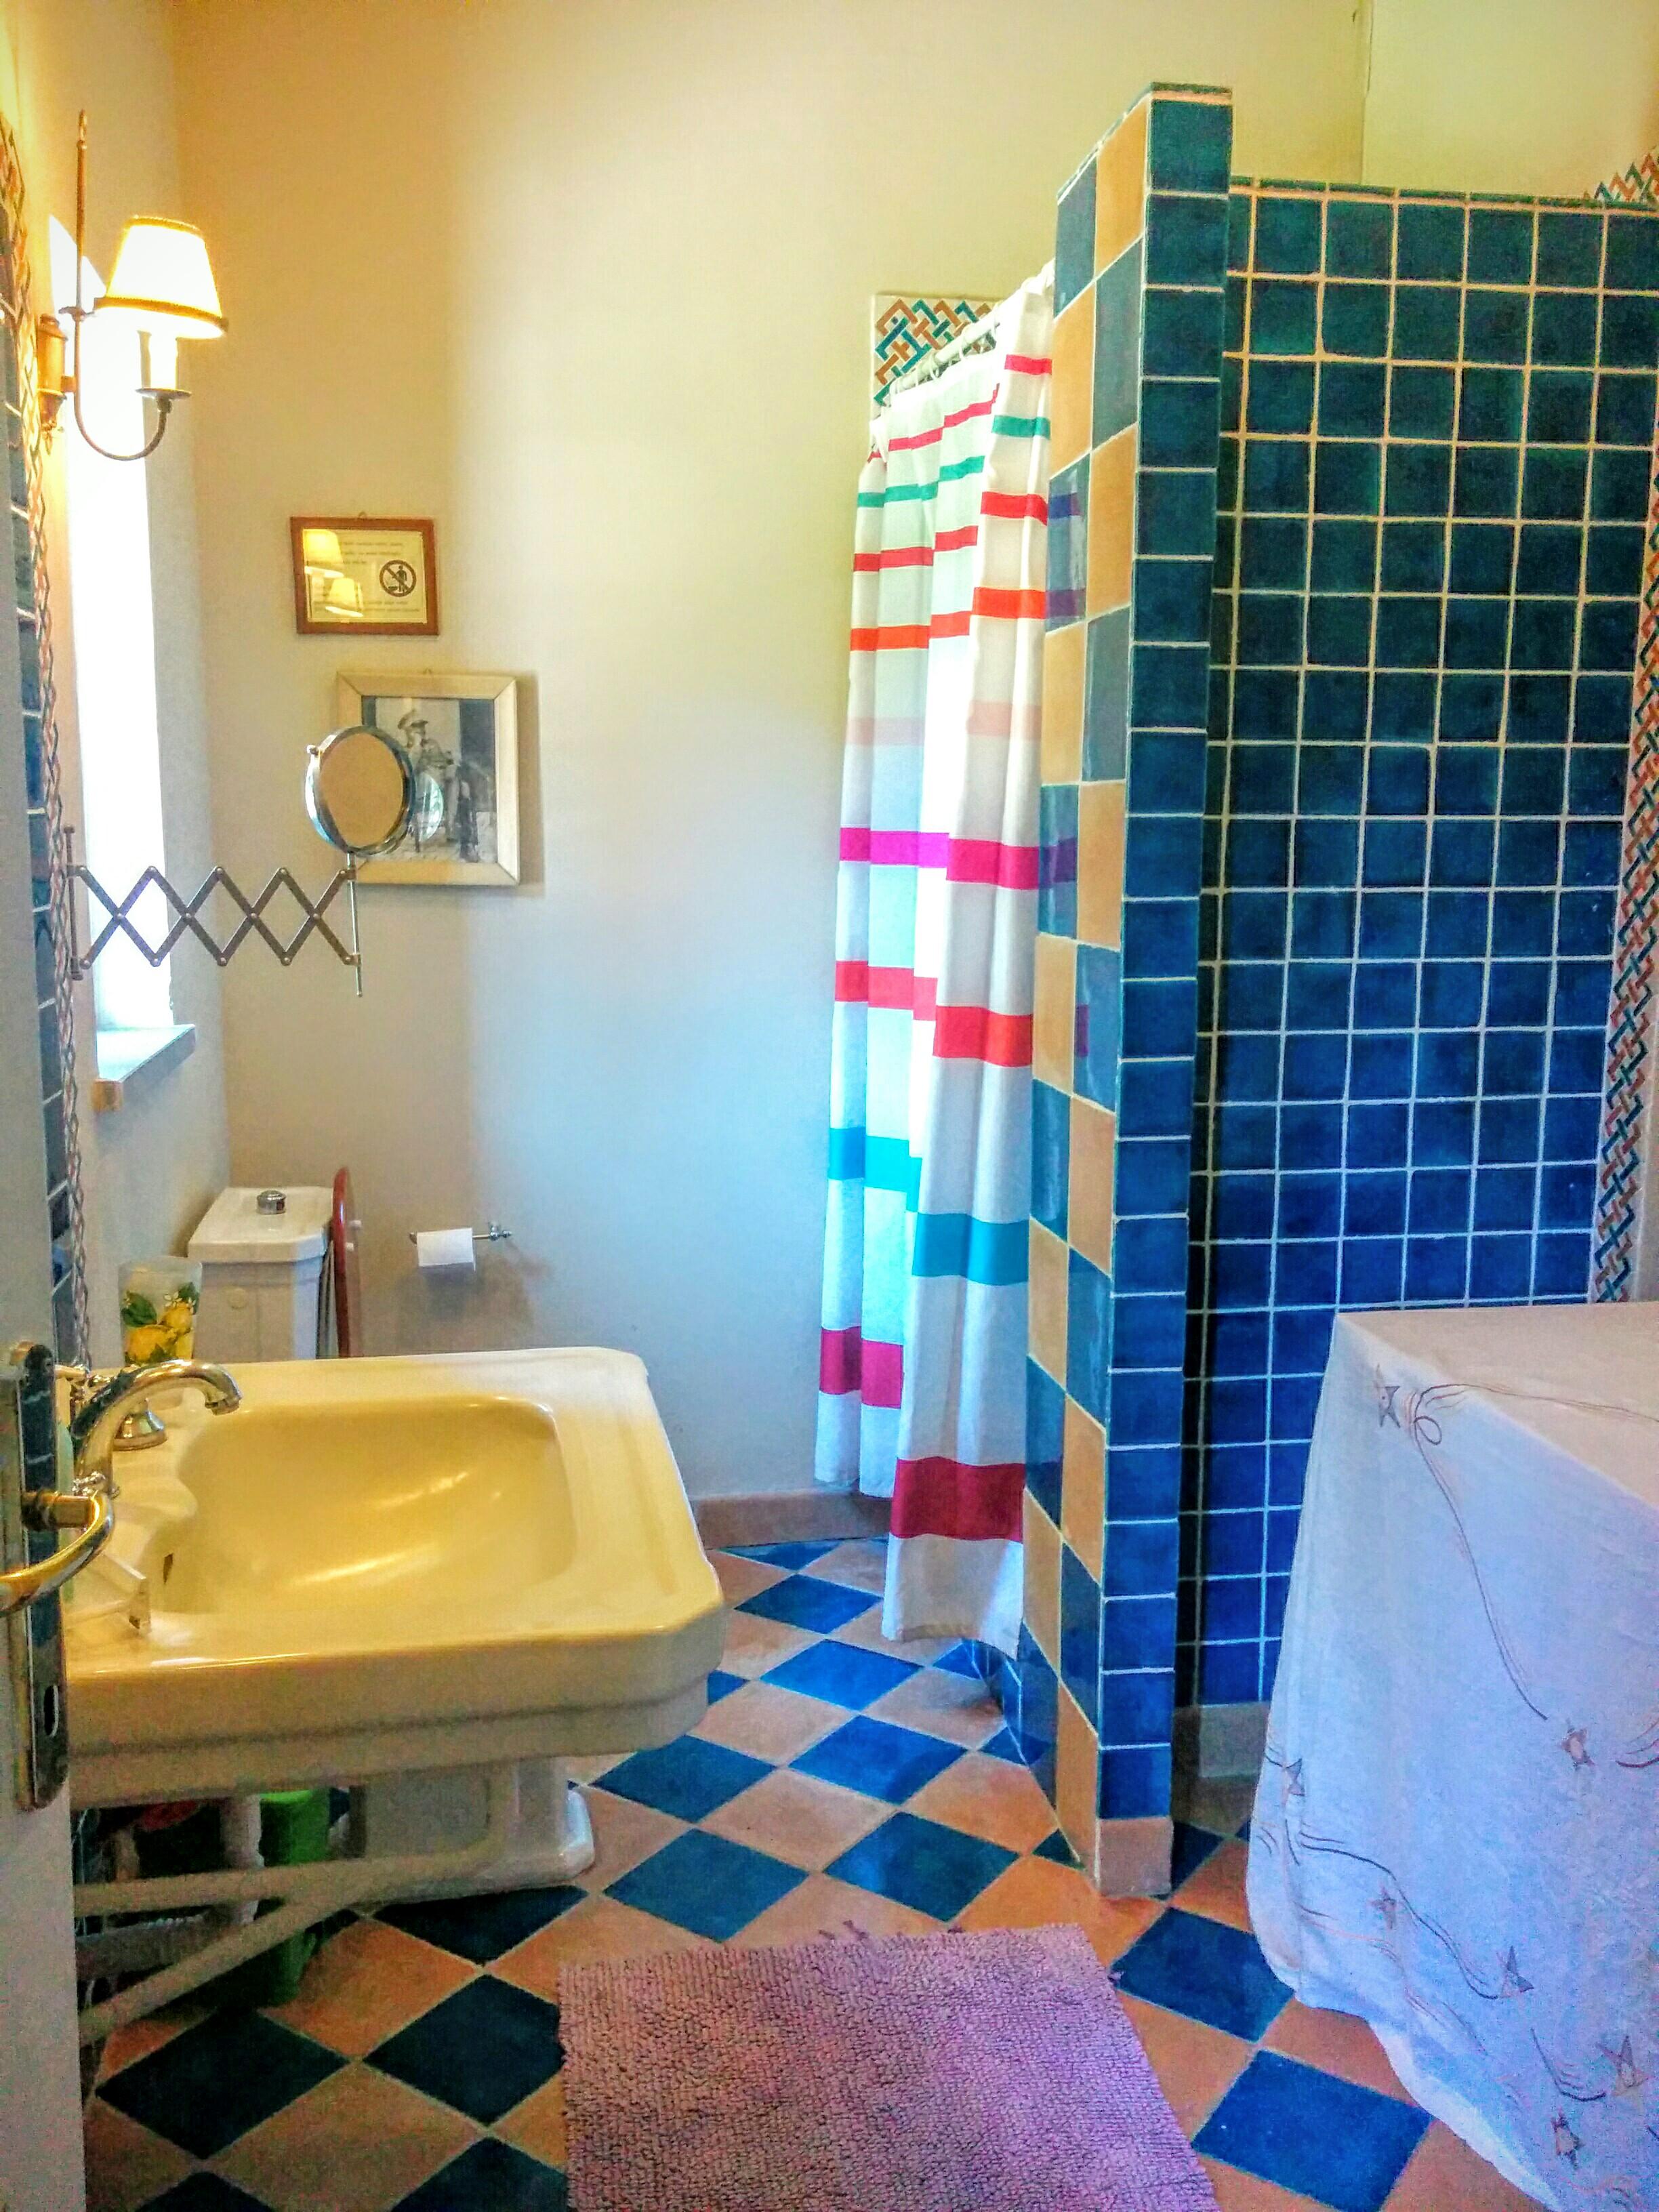 Ezedra shower room